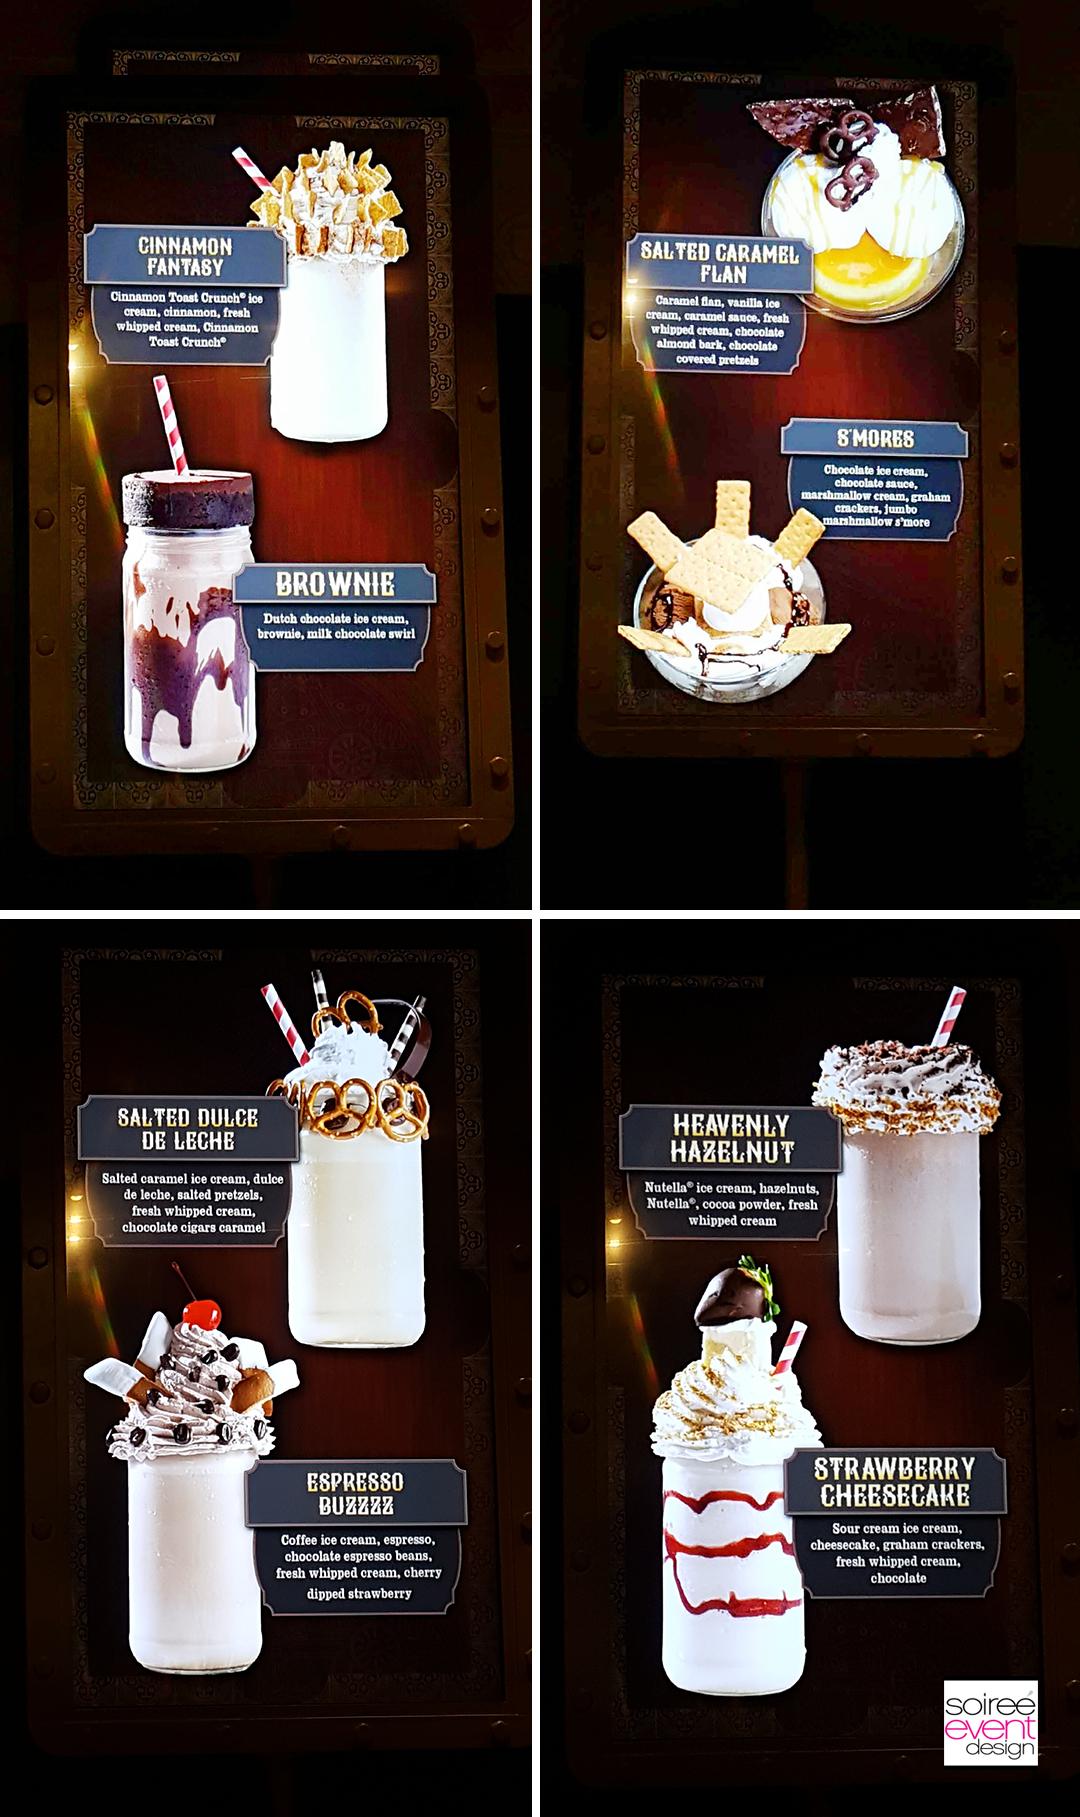 toothsome-chocolate-emporium-milkshakes-at-universal-orlando-citywalk